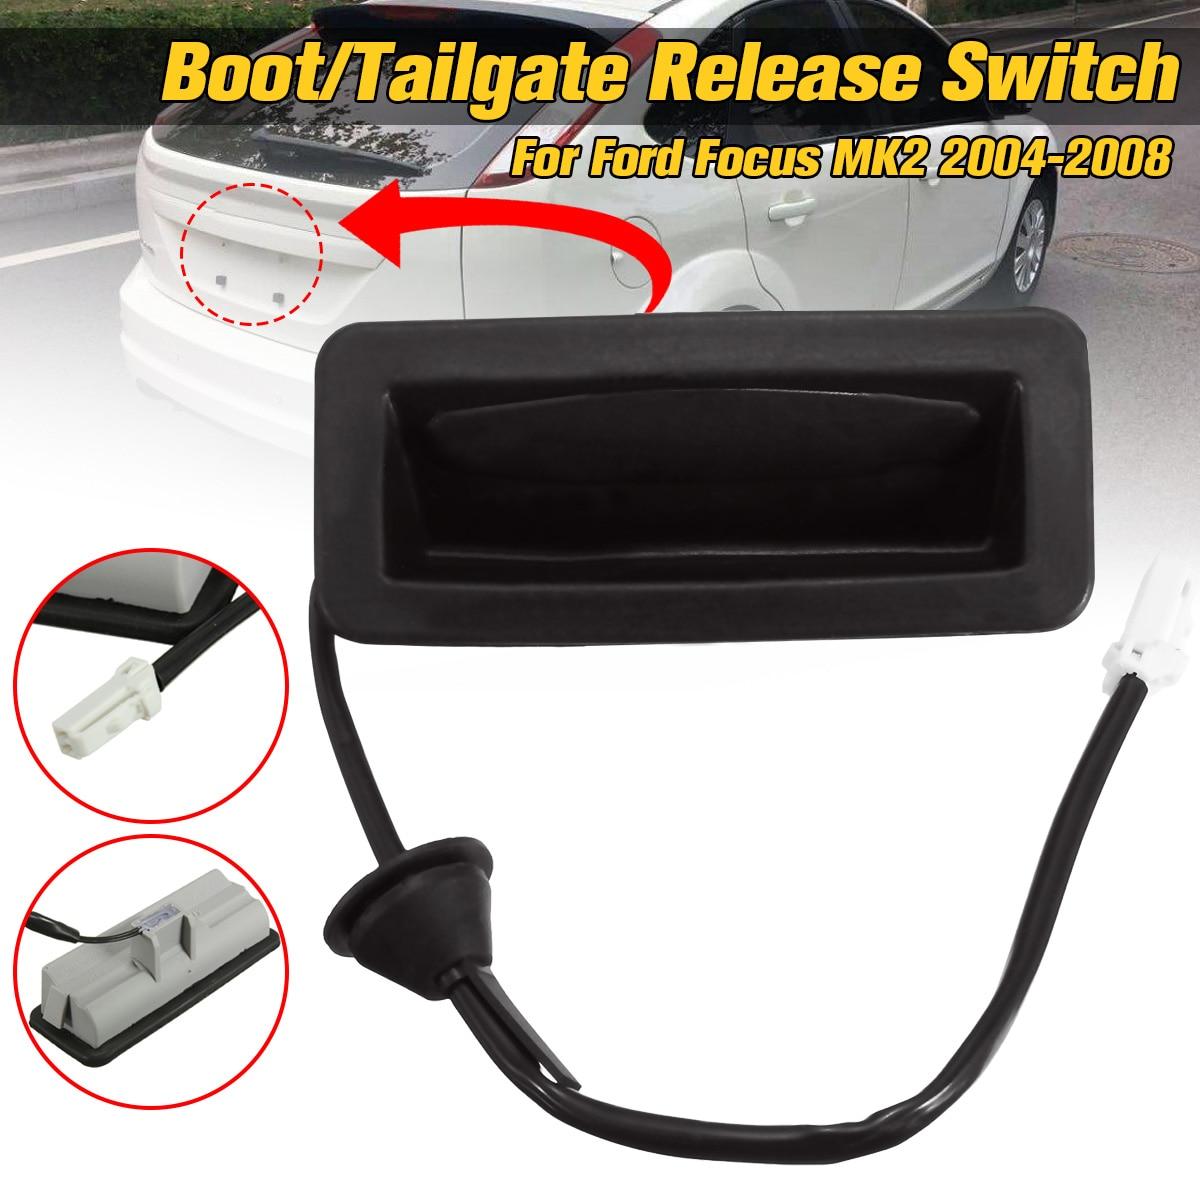 Переключатель багажника с разъемом для багажника, автомобильный переключатель для Ford Focus MK2 2005 2006 2007 2008 3M5119B514AC